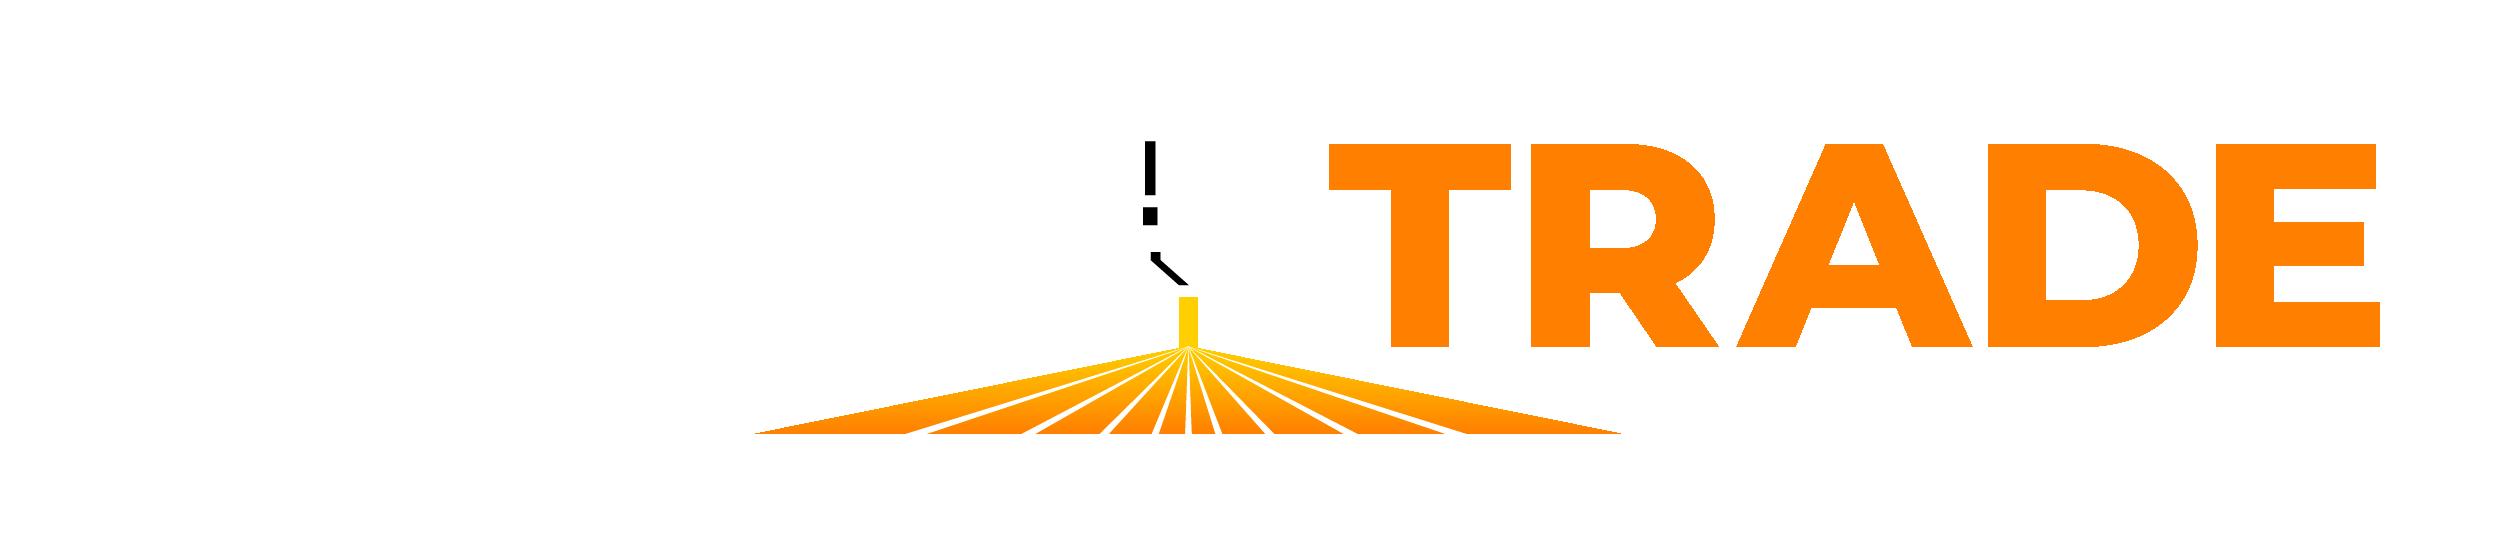 Laser Trade Logo